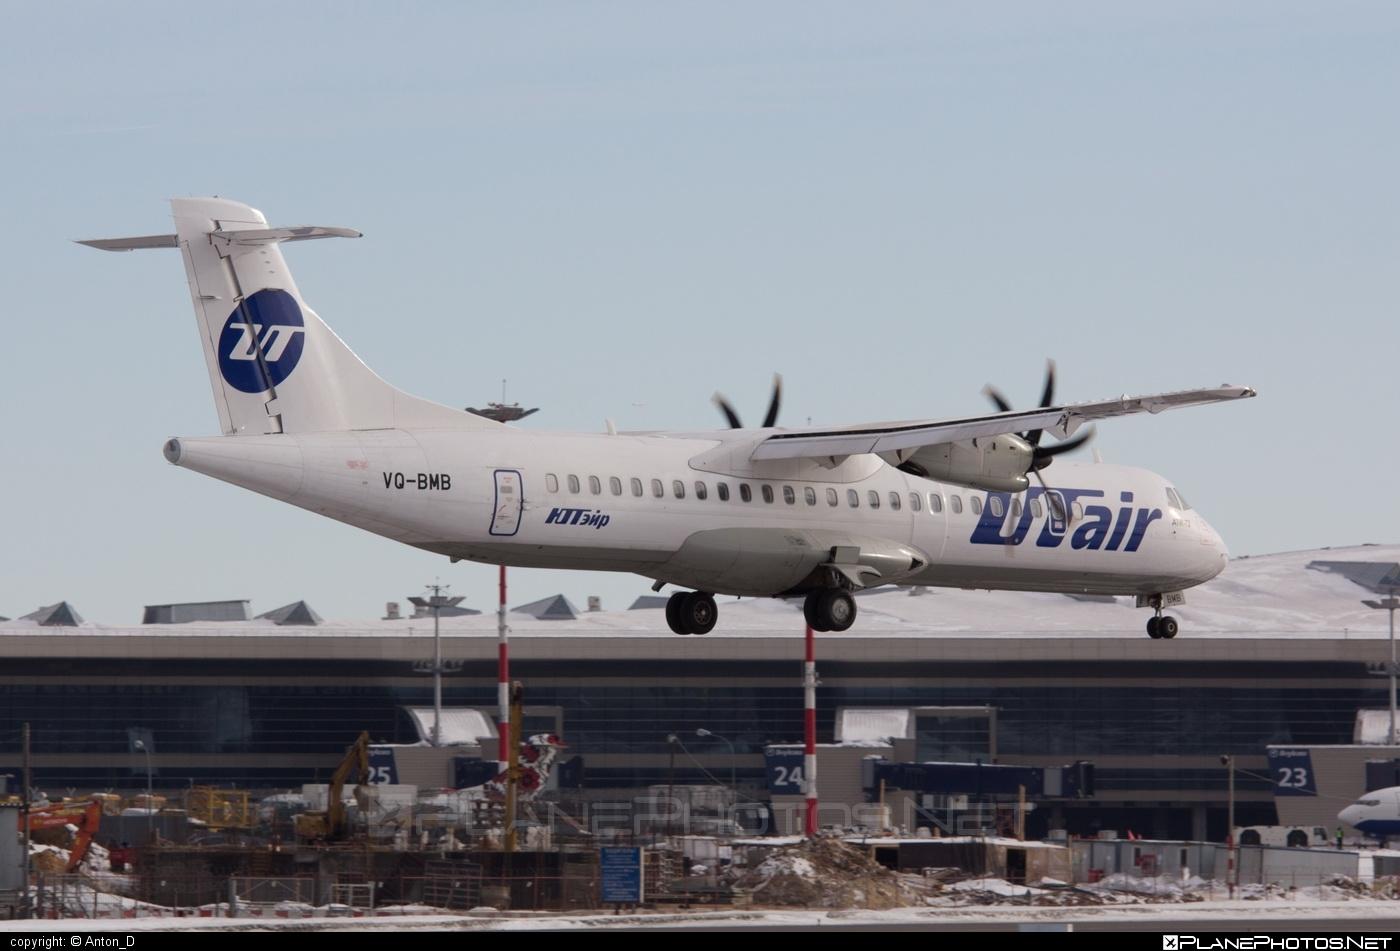 ATR 72-212A - VQ-BMB operated by UTair Aviation #atr #utair #utairaviation